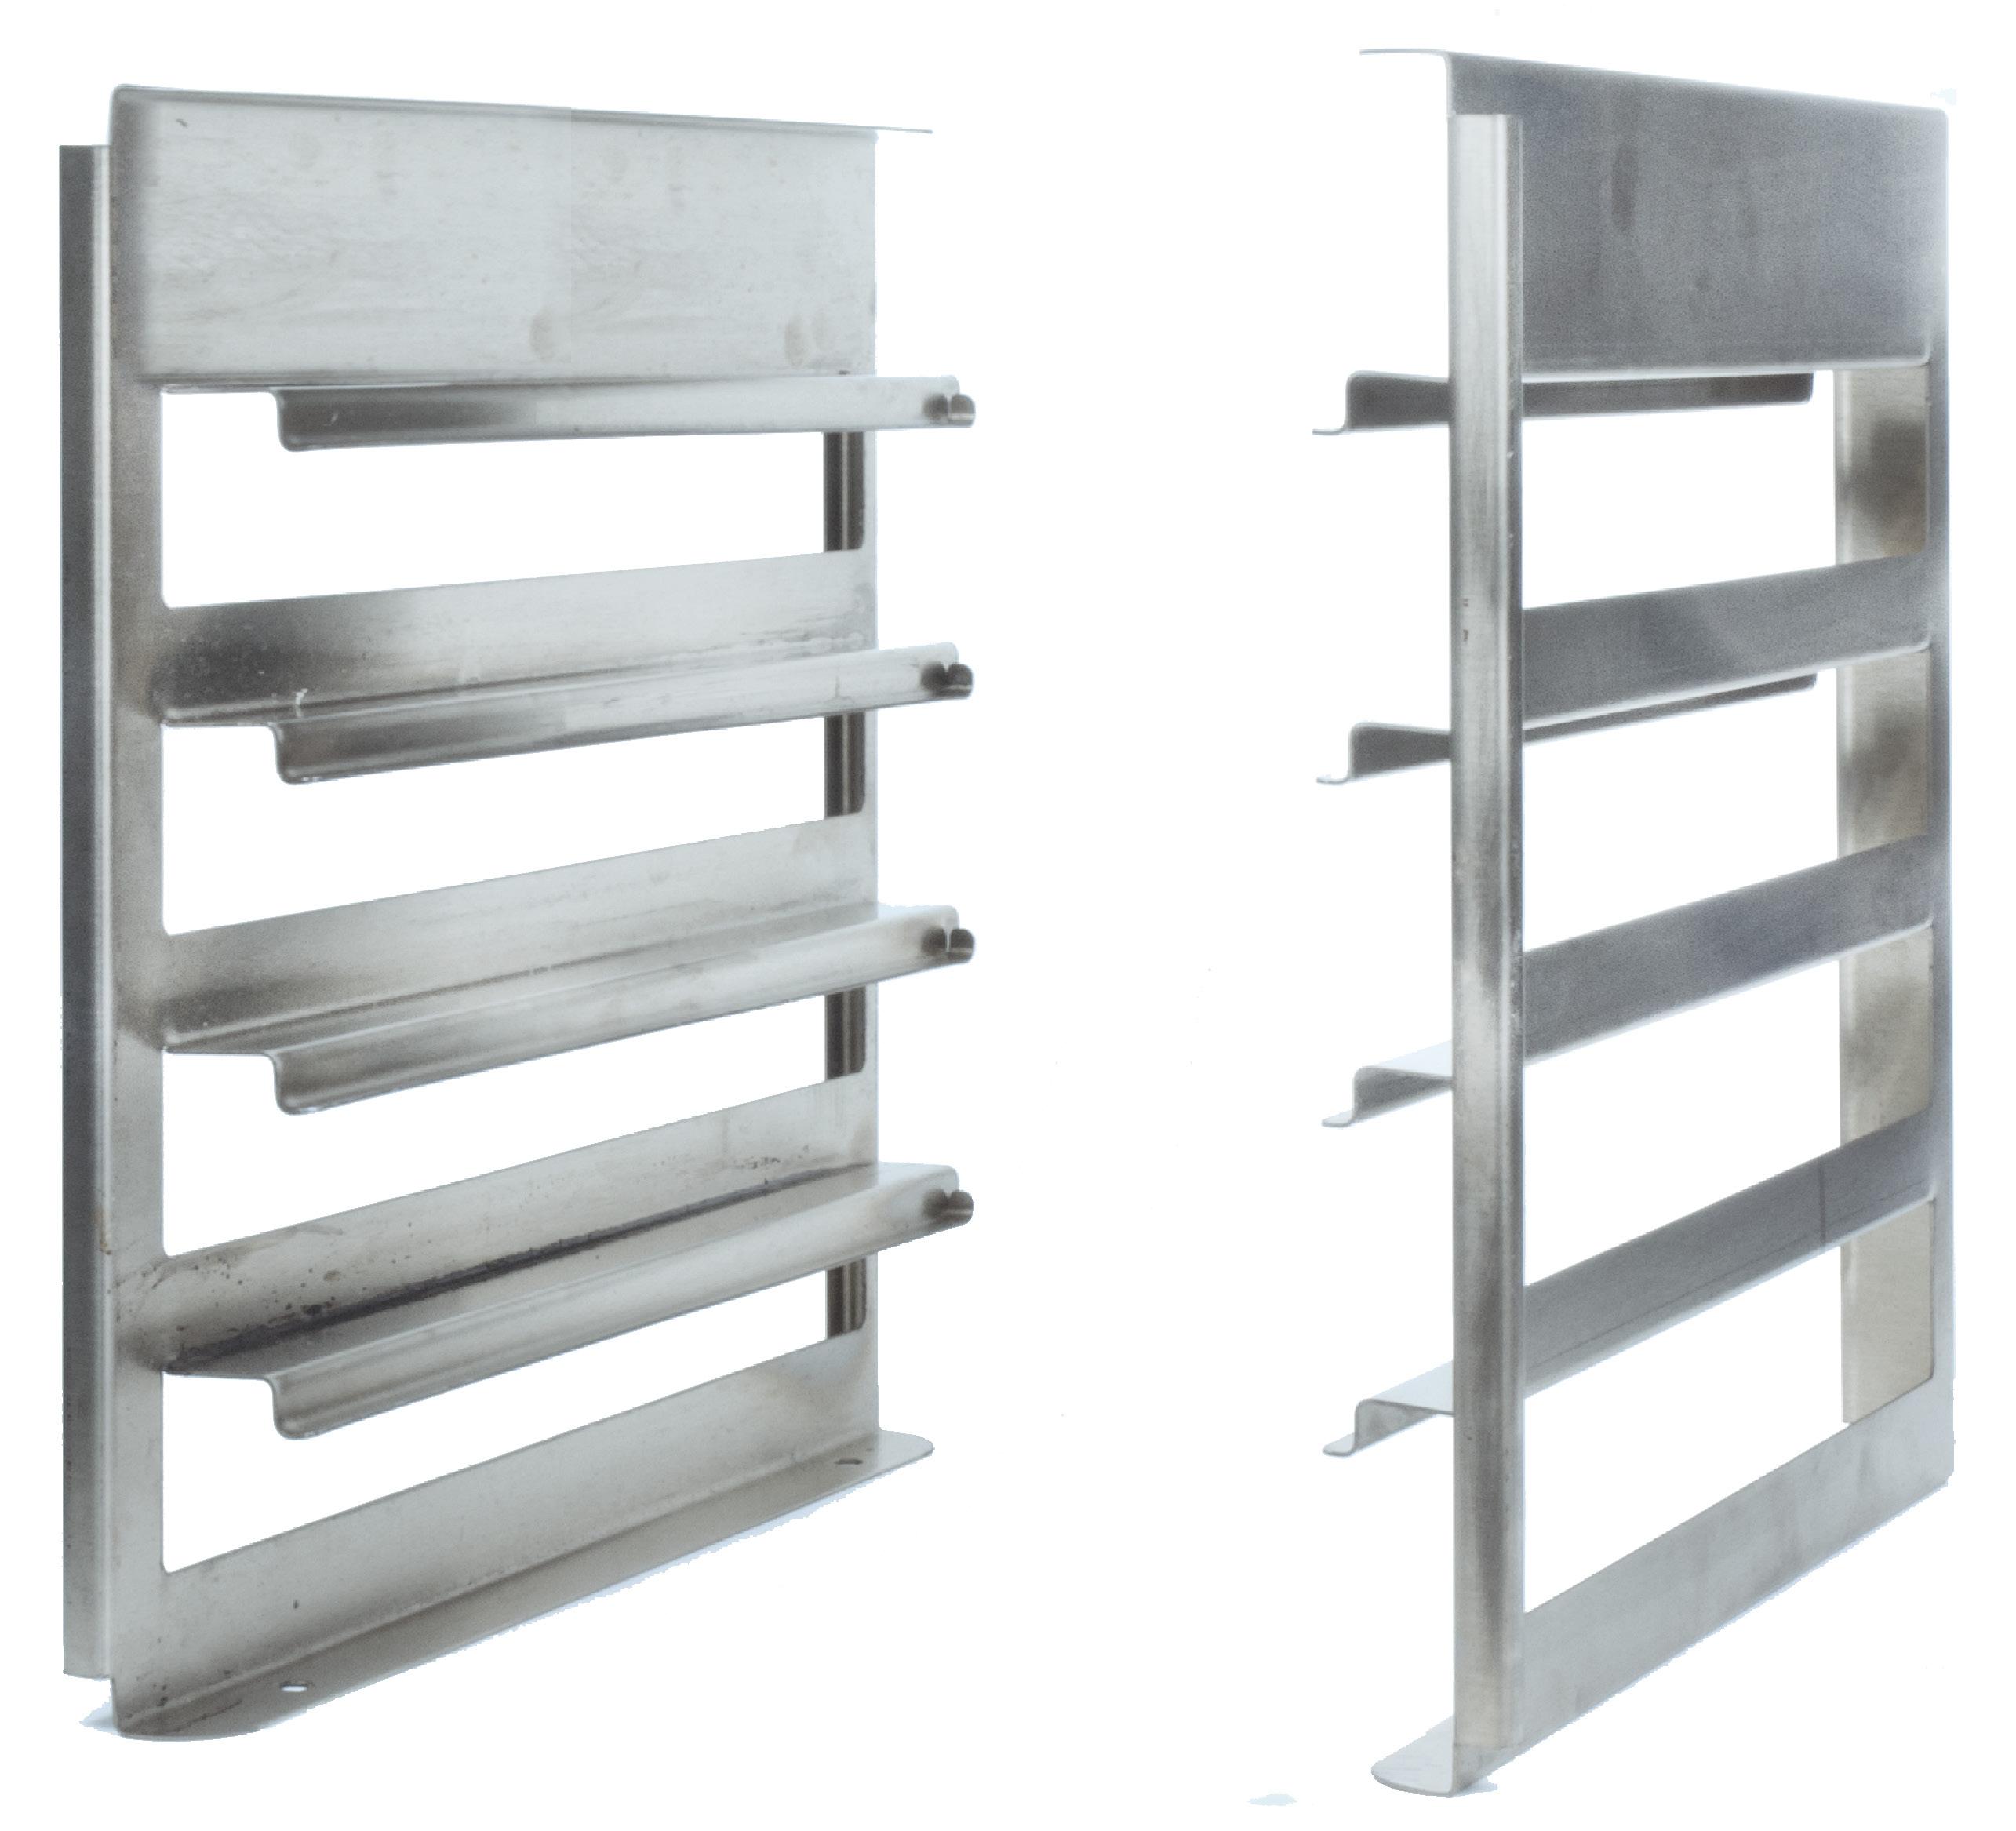 Eurast 46534202 Pastry rack (pair) 4 levels for 2 - 5 series ovens